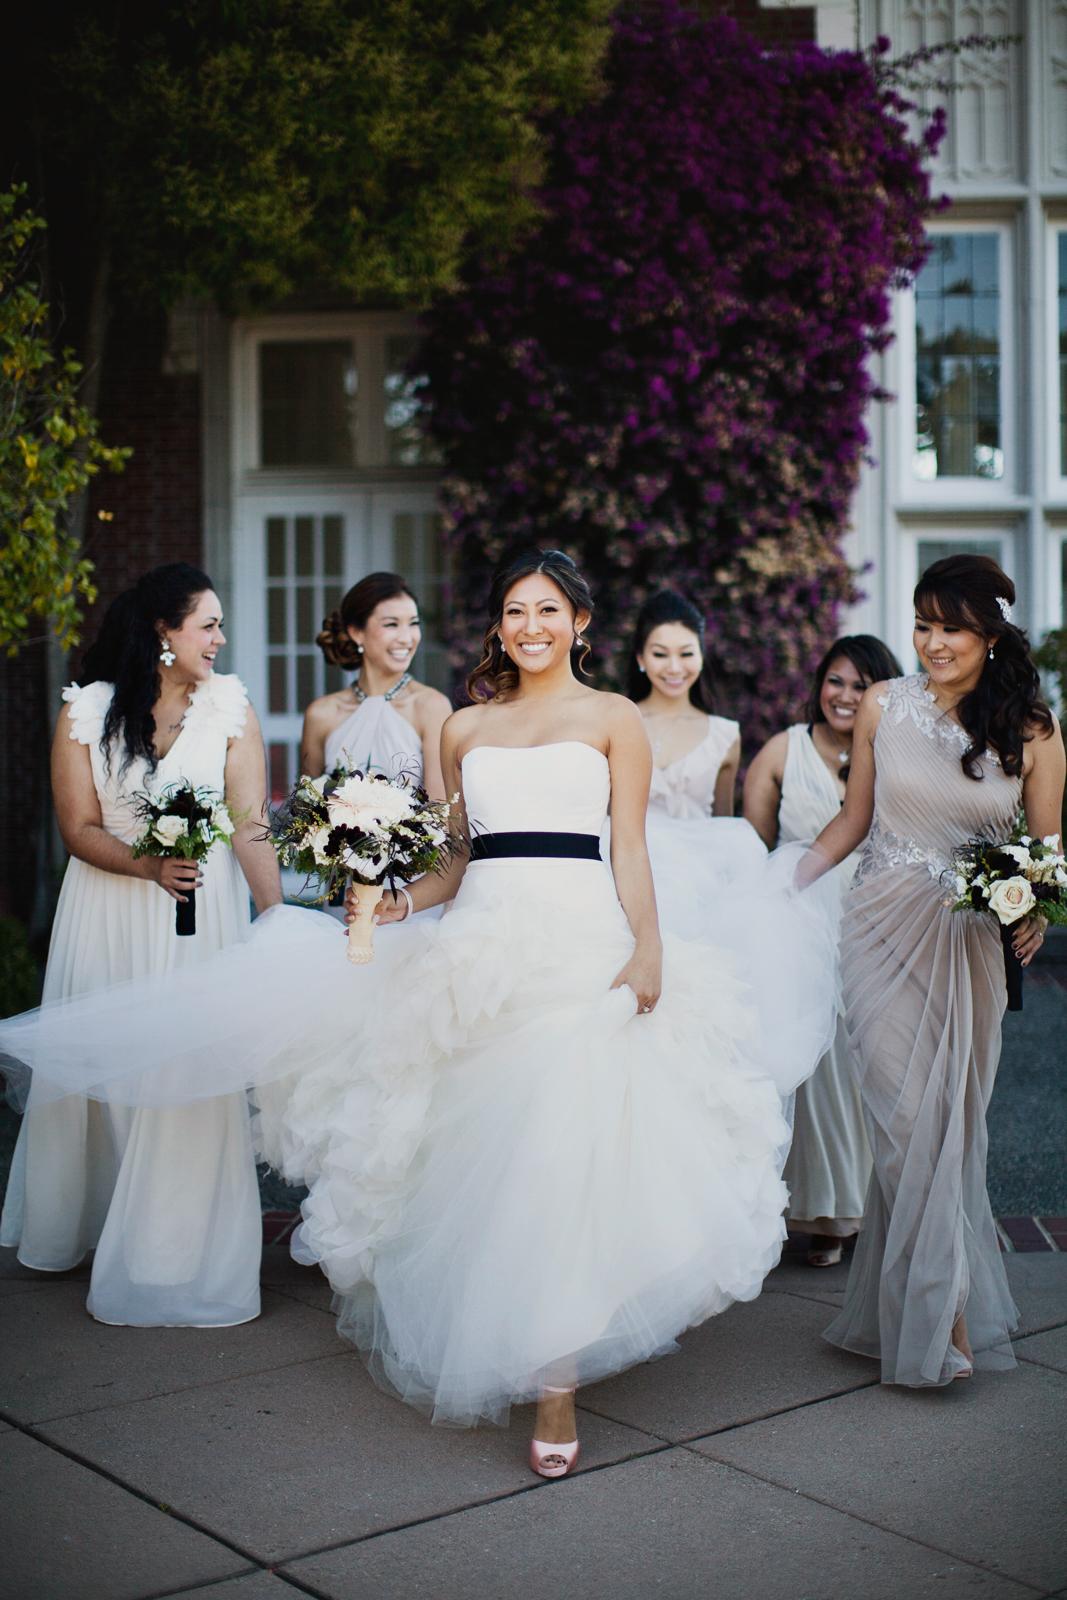 kohl_mansion_wedding_photography_samantha_gene_ebony_siovhan_bokeh_photography_108.jpg